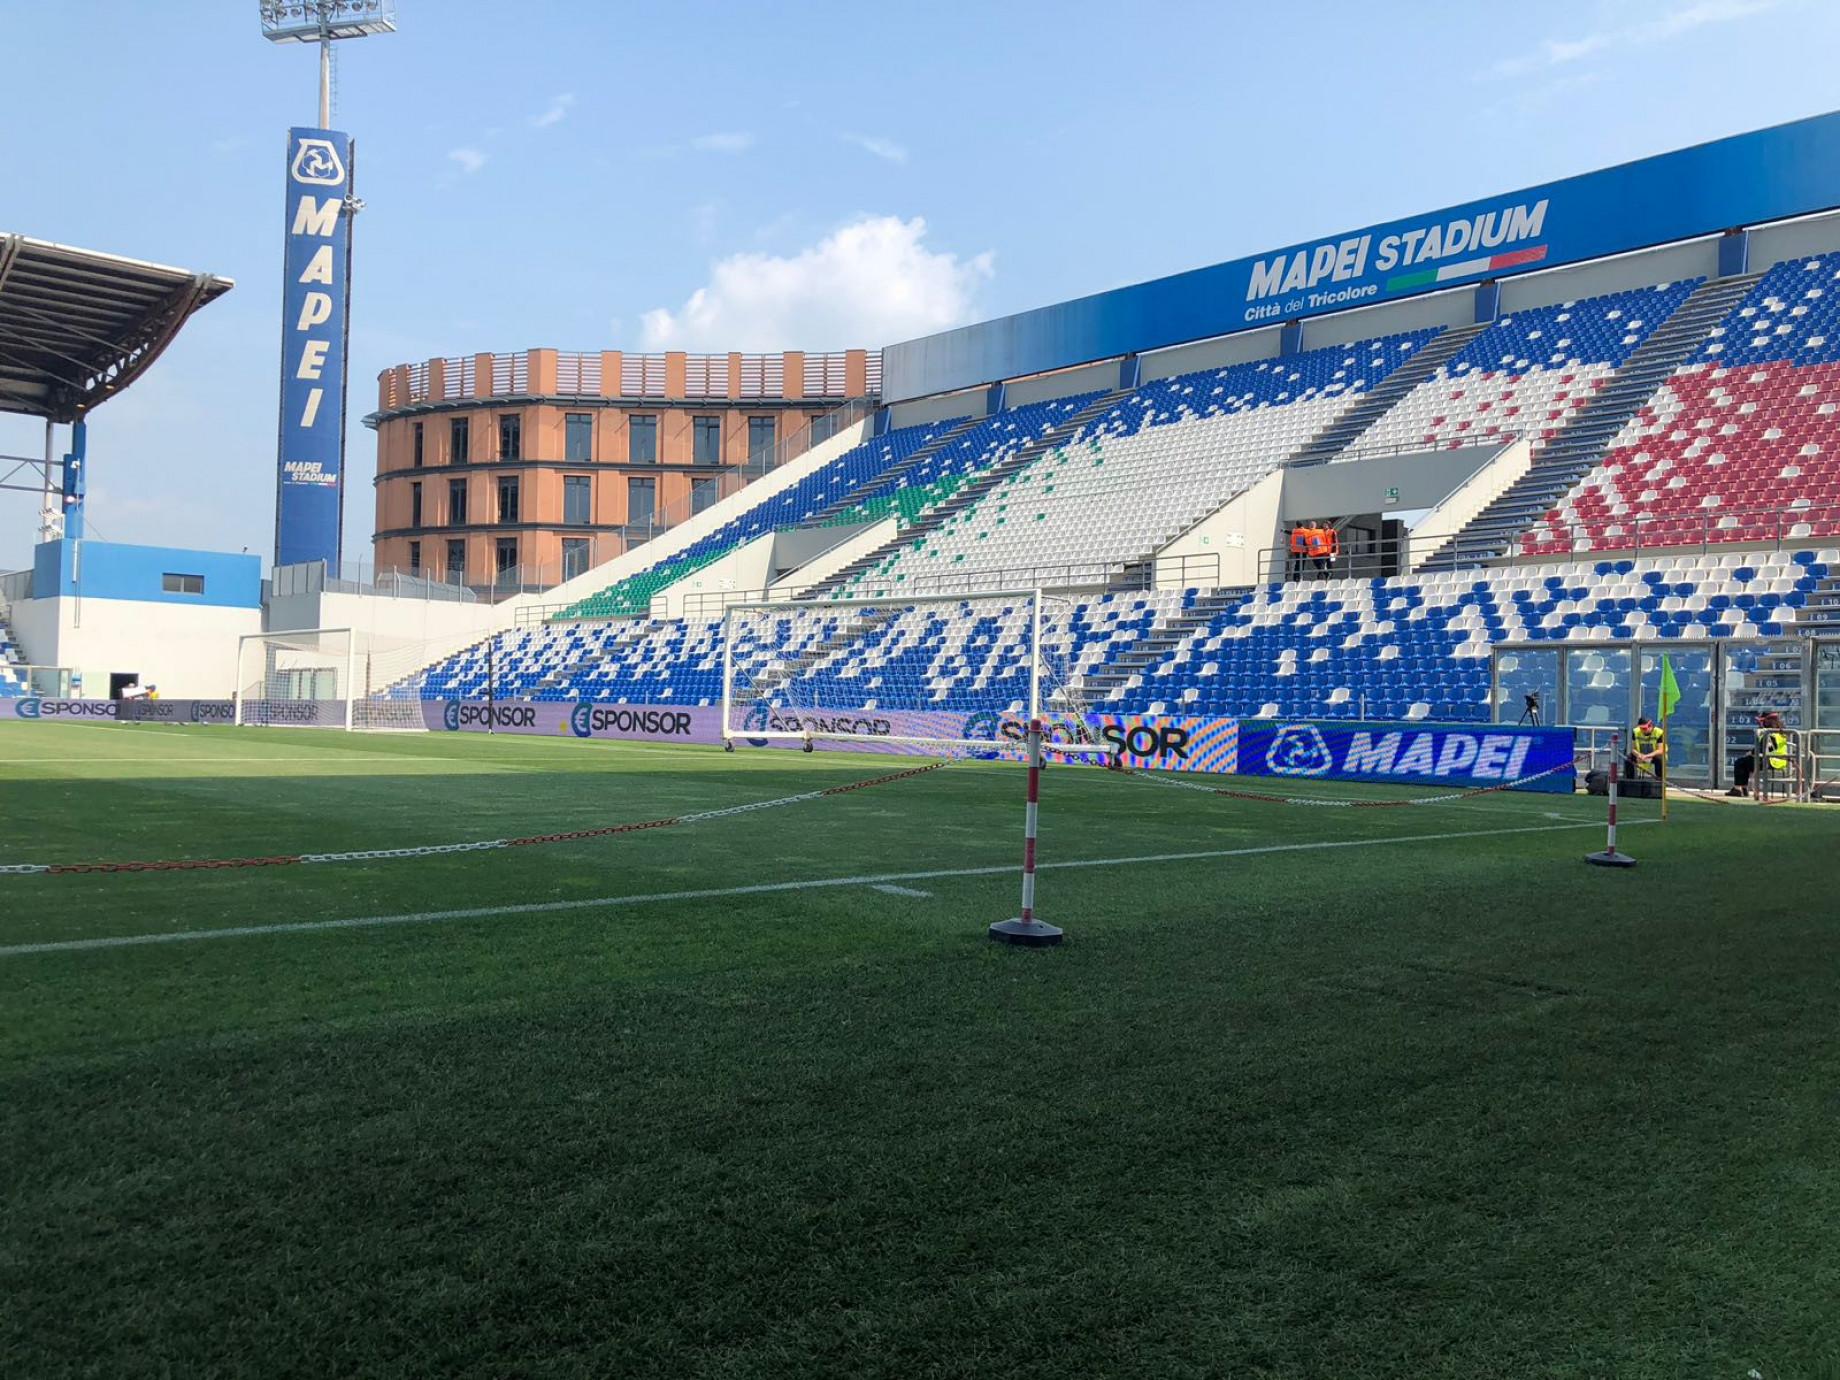 mapei_stadium.jpeg